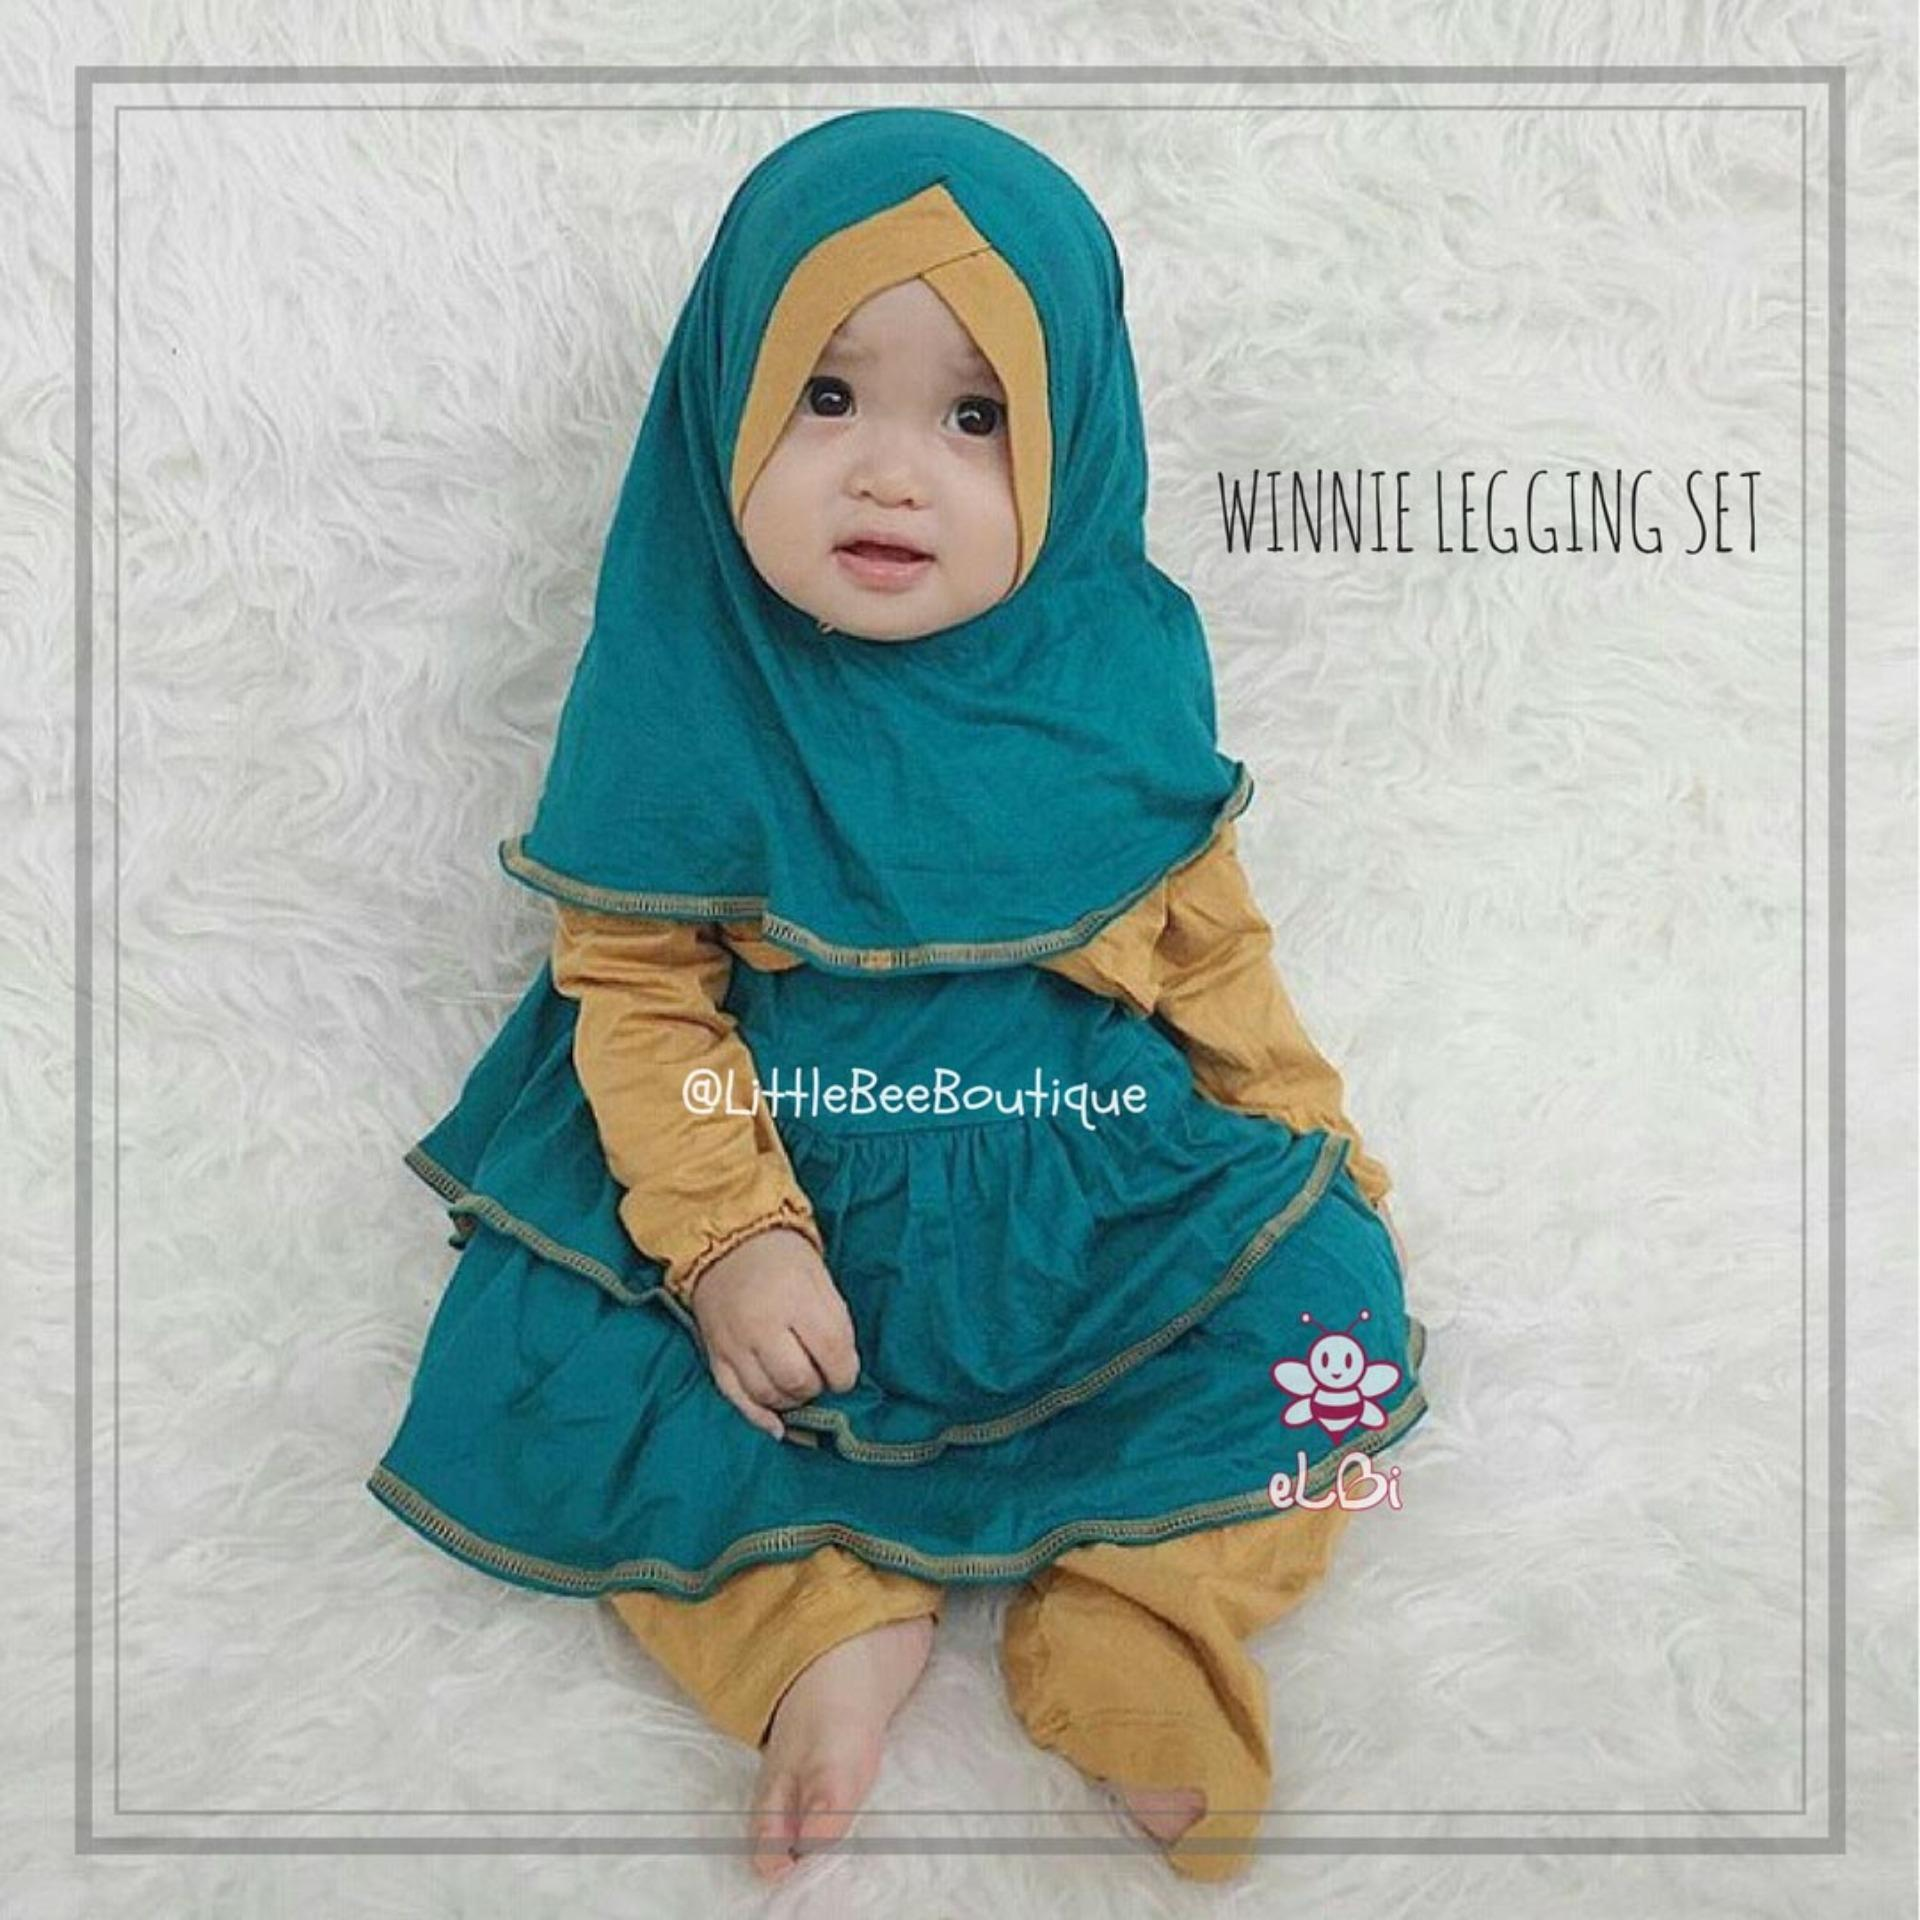 Review Toko Elbi Winnie Legging Set Baju Muslim Balita Baju Muslim Bayi Perempuan By Little Bee Boutique